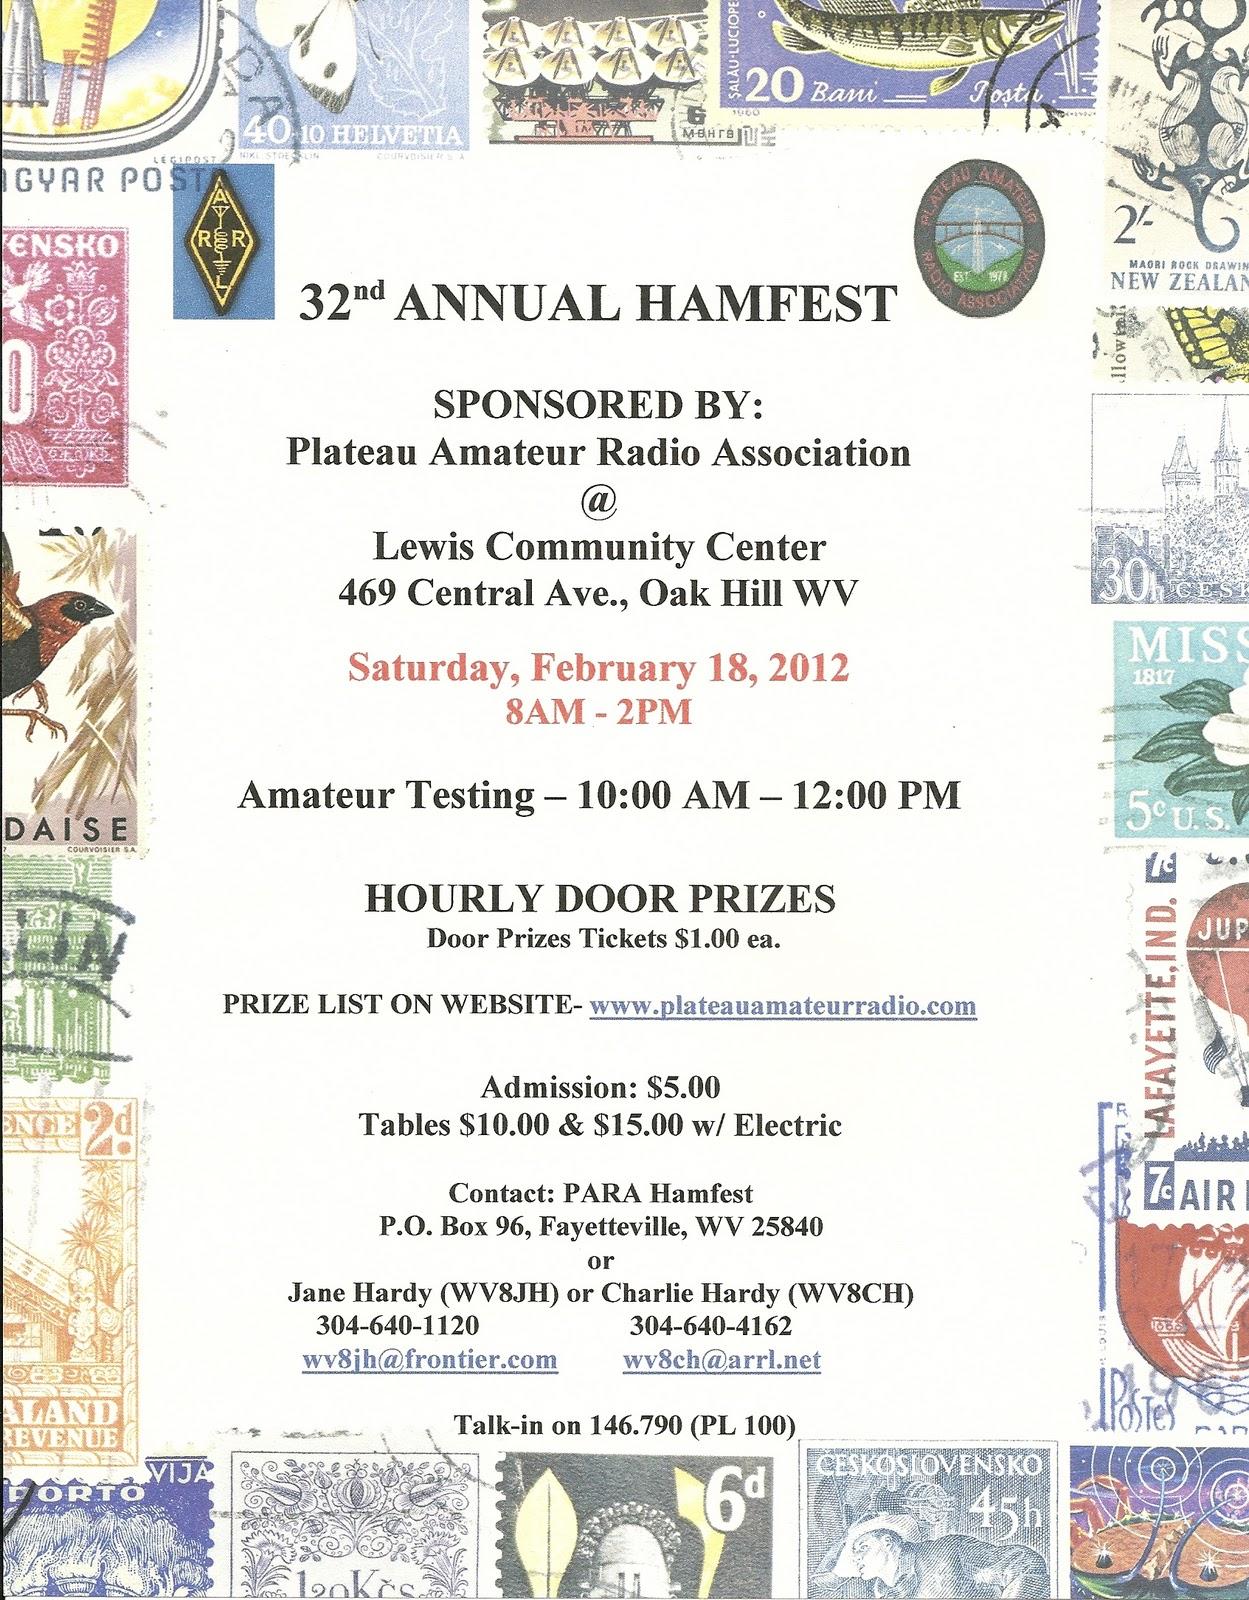 plateau-amateur-radio-association-hamfest-flyer.jpg